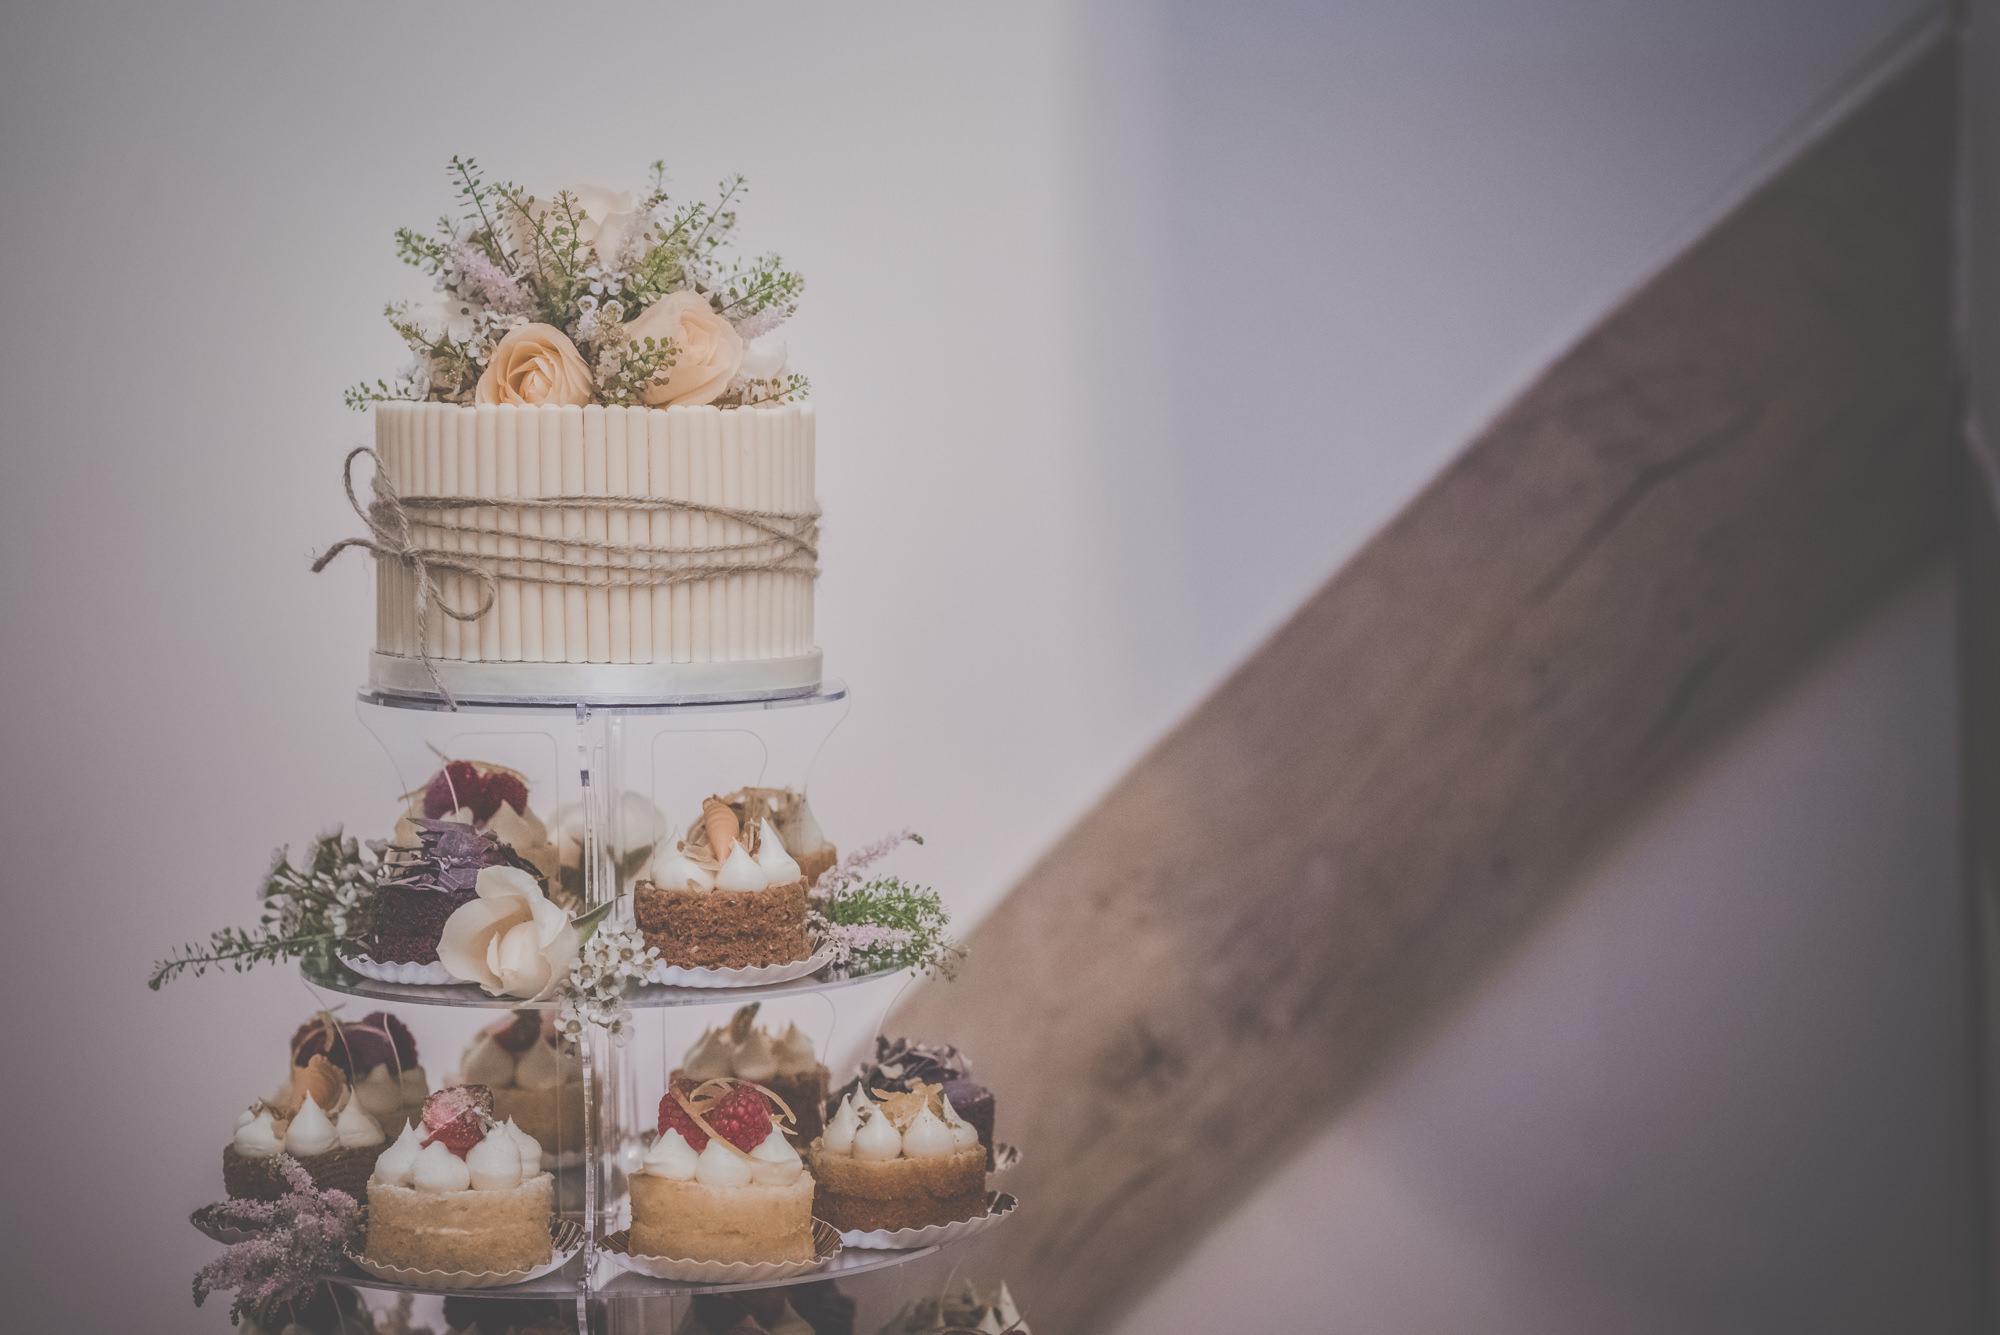 Charisse-and-James-wedding-in-Cain-Manor-Venue-Hampshire-Manu-Mendoza-Wedding-Photography-414.jpg